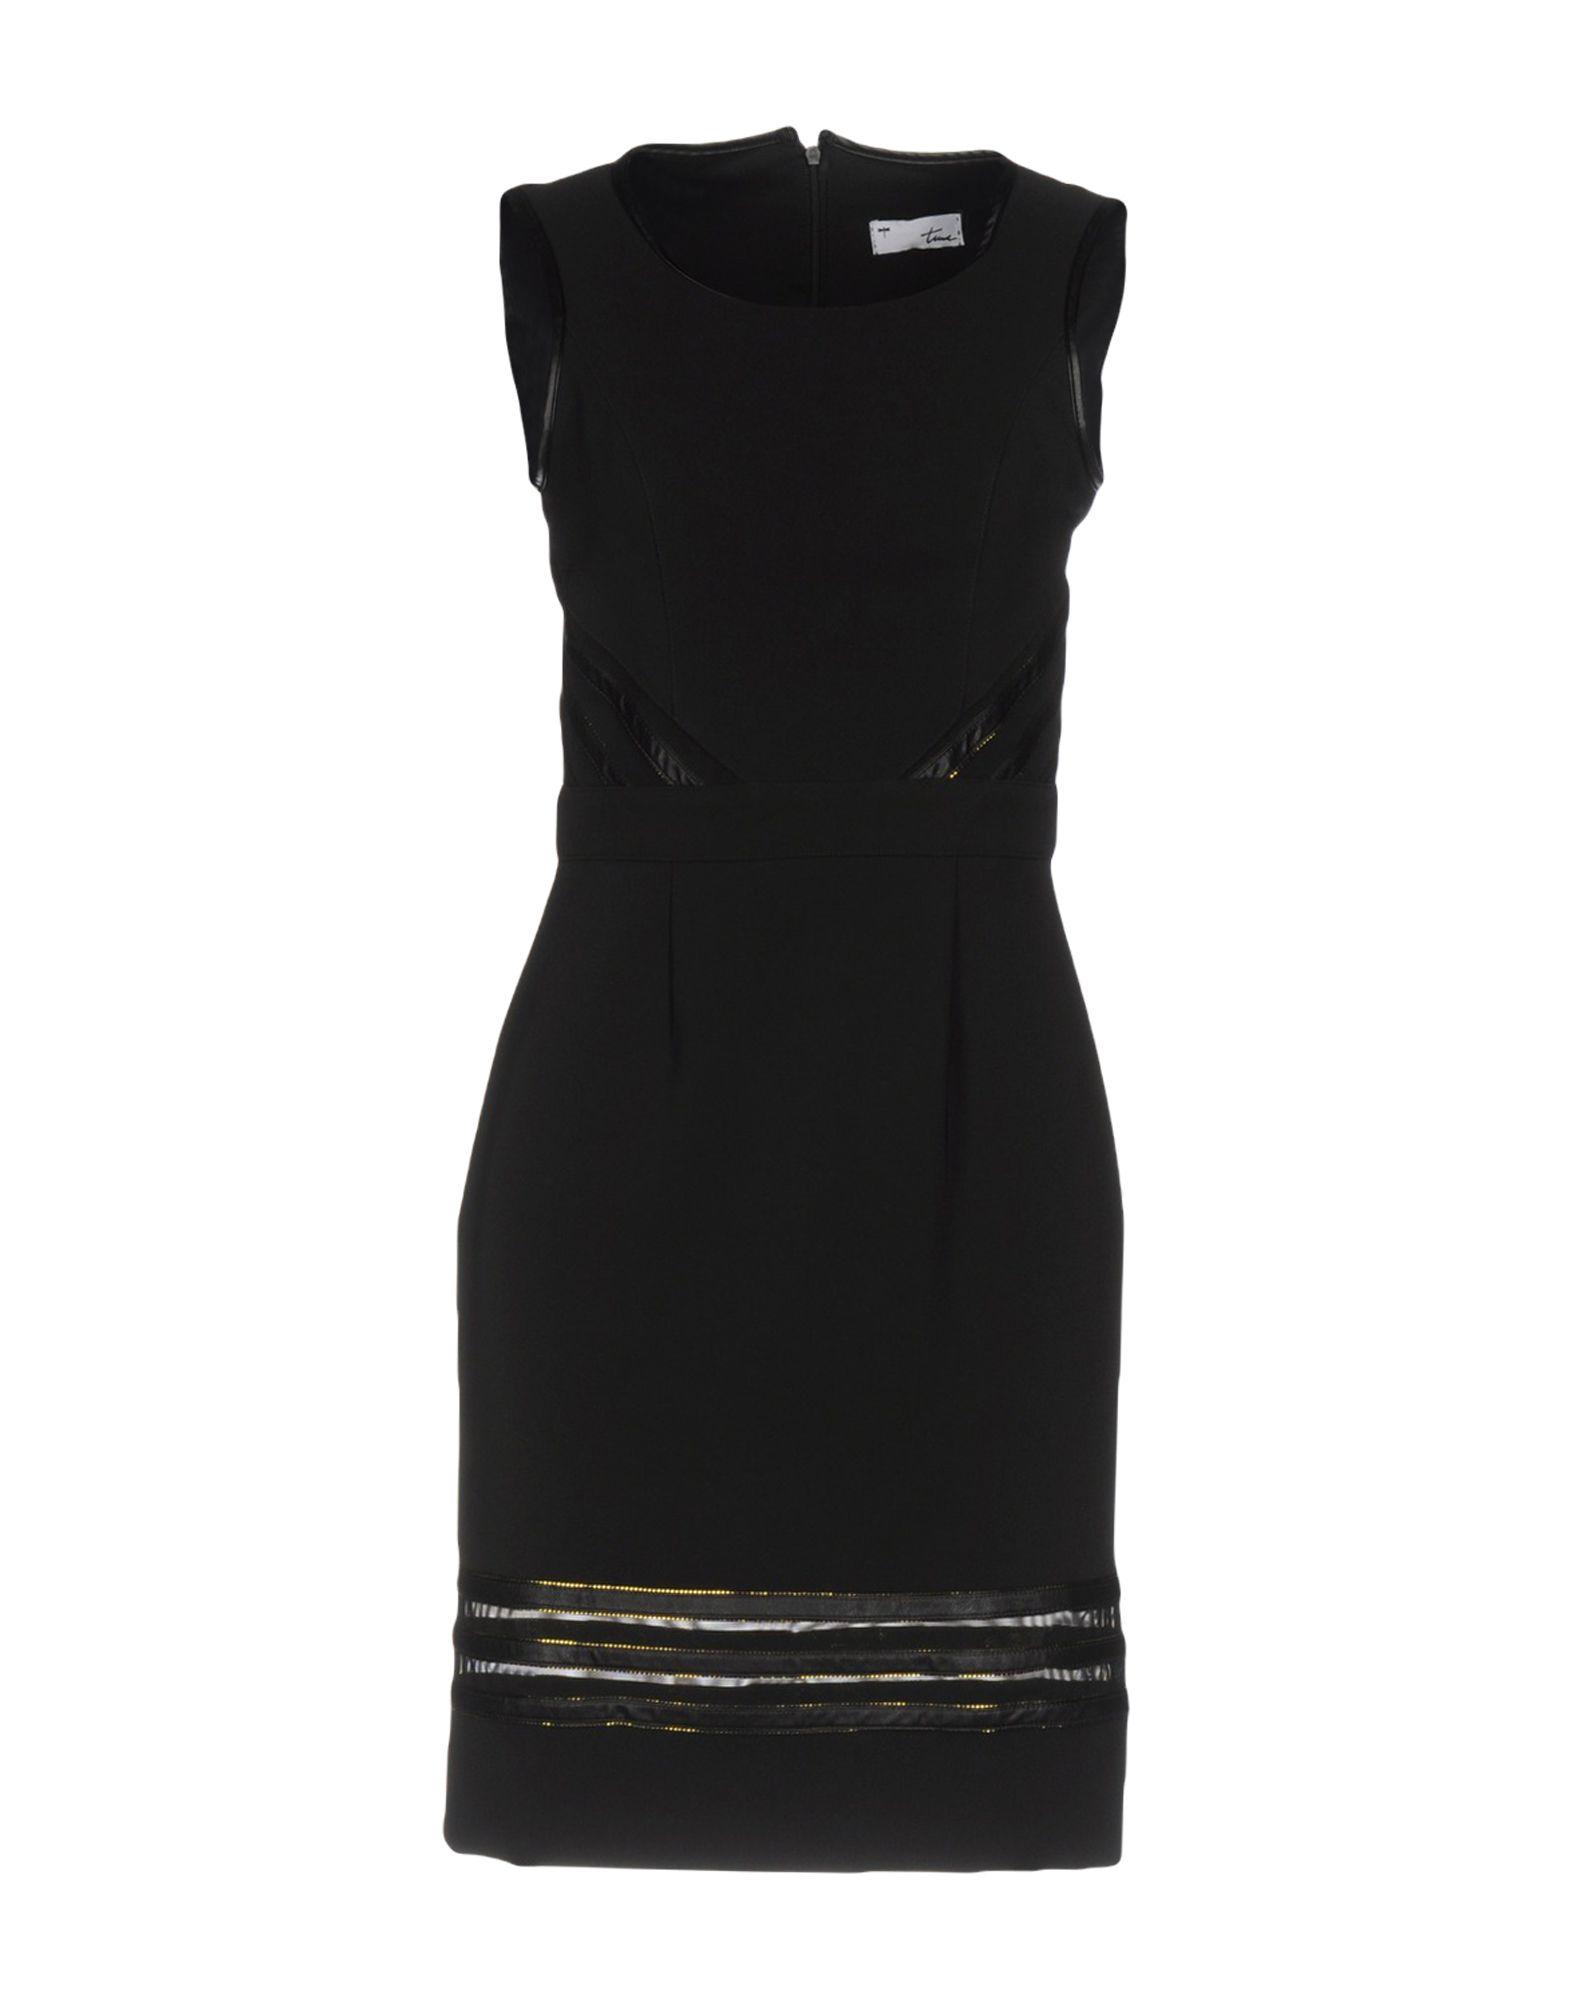 Фото - TUWE ITALIA Короткое платье tuwe italia брюки капри